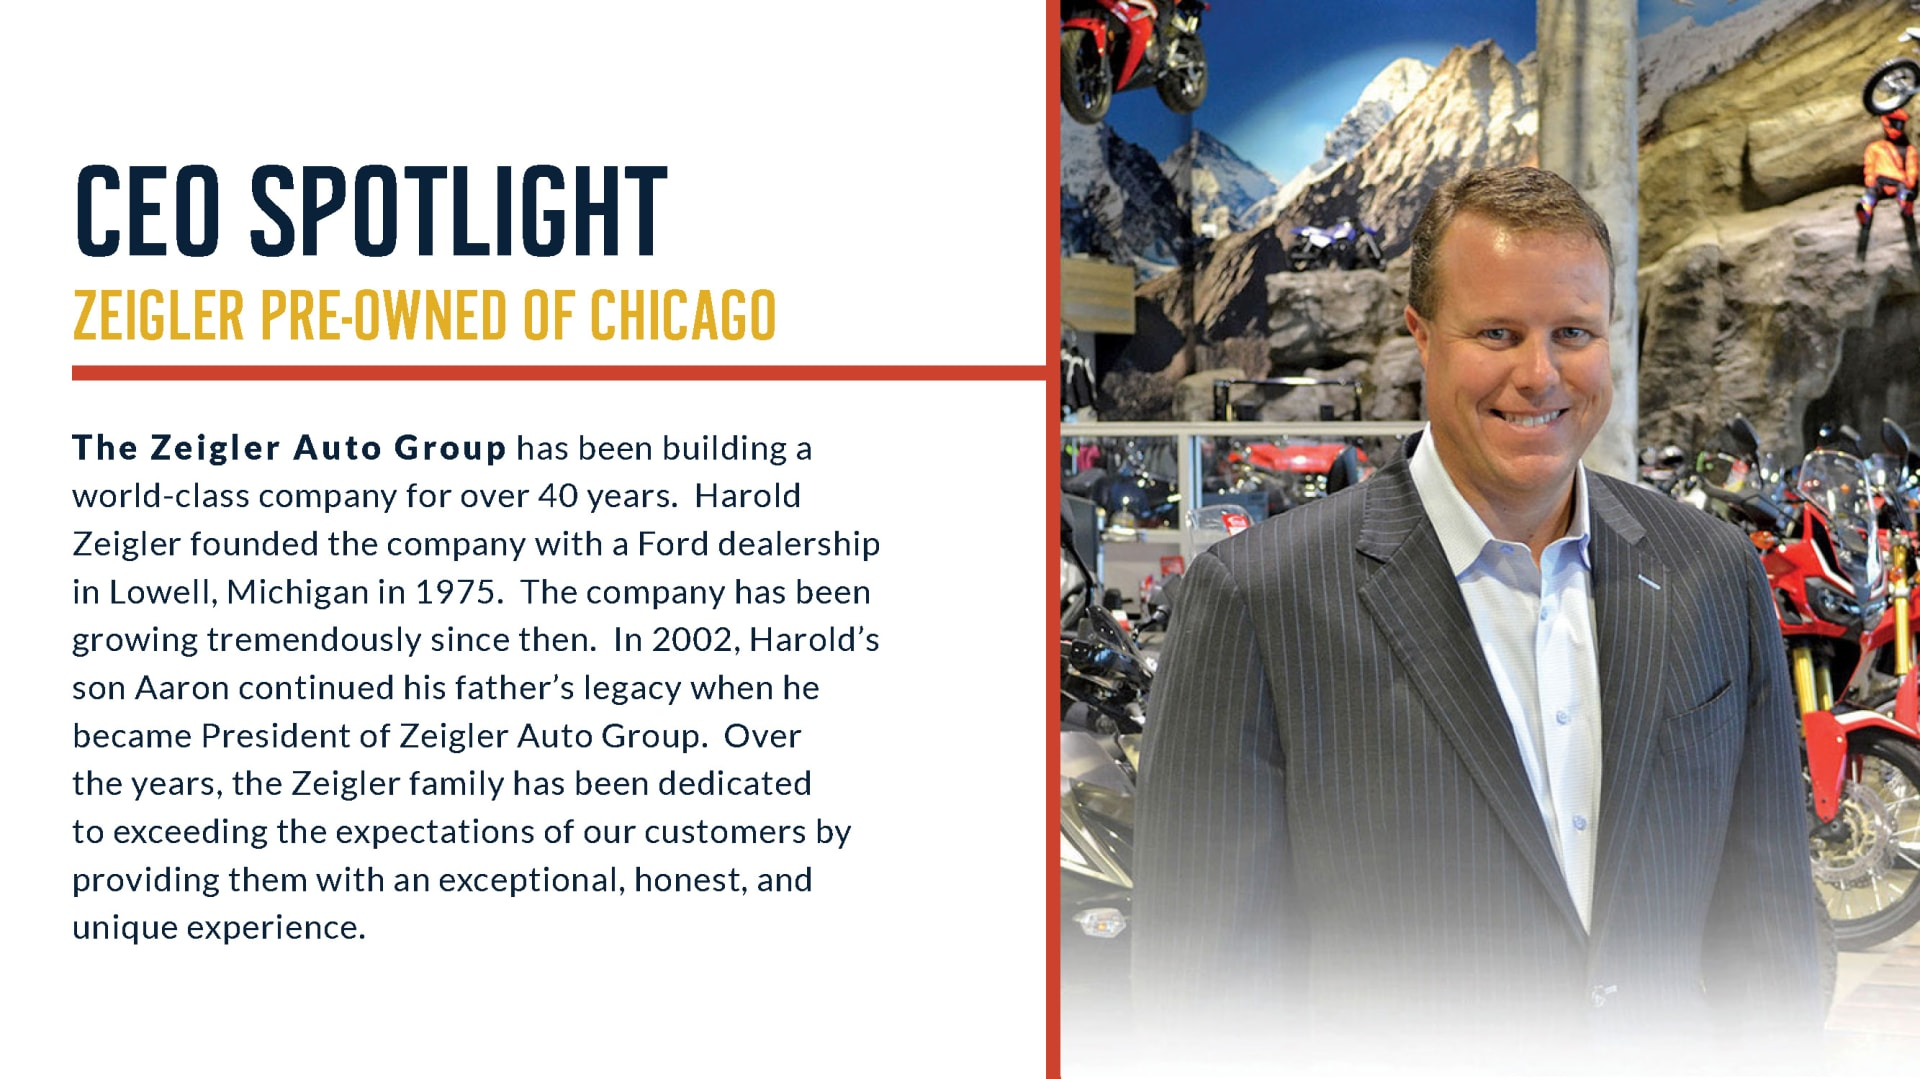 CEO-Spotlights-2020_Page_7-w1920.jpg